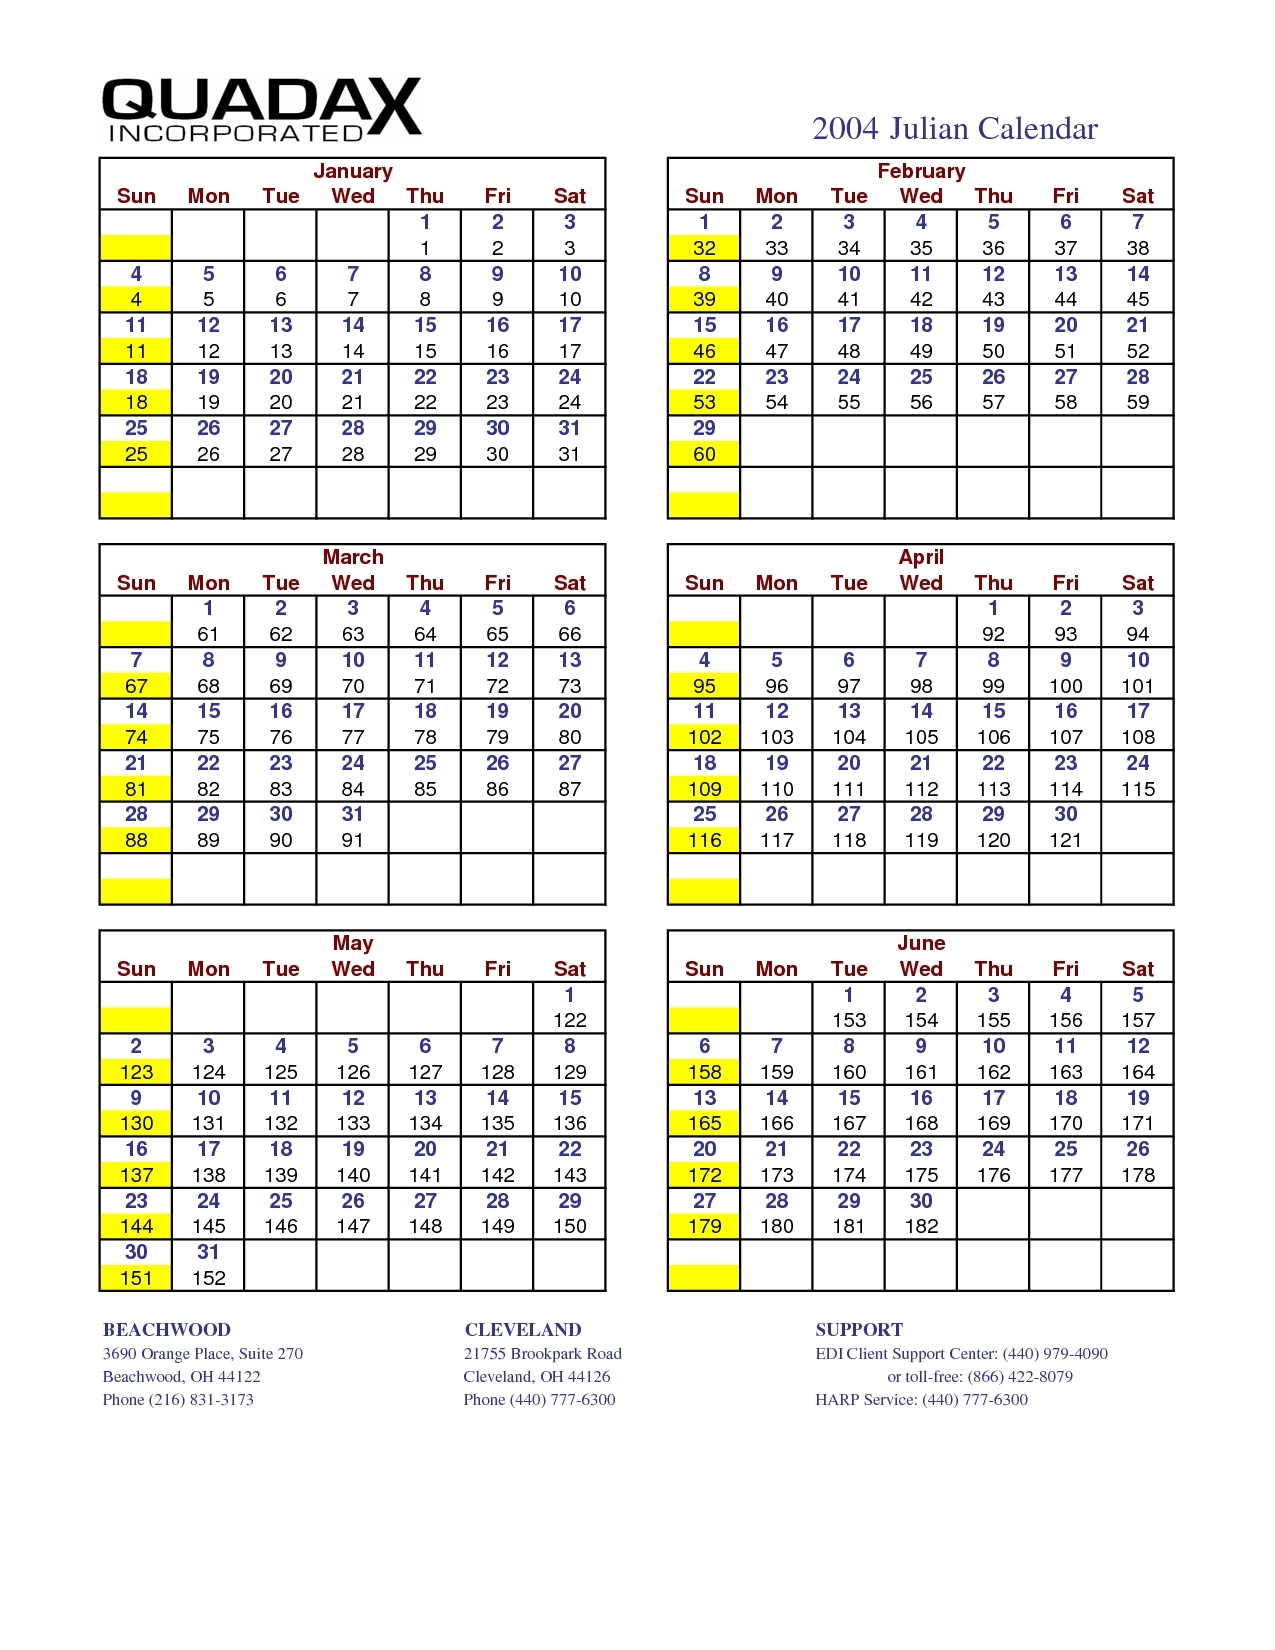 Perfect Quadax Julian Date Calendar 2021 | Get Your Calendar Printable